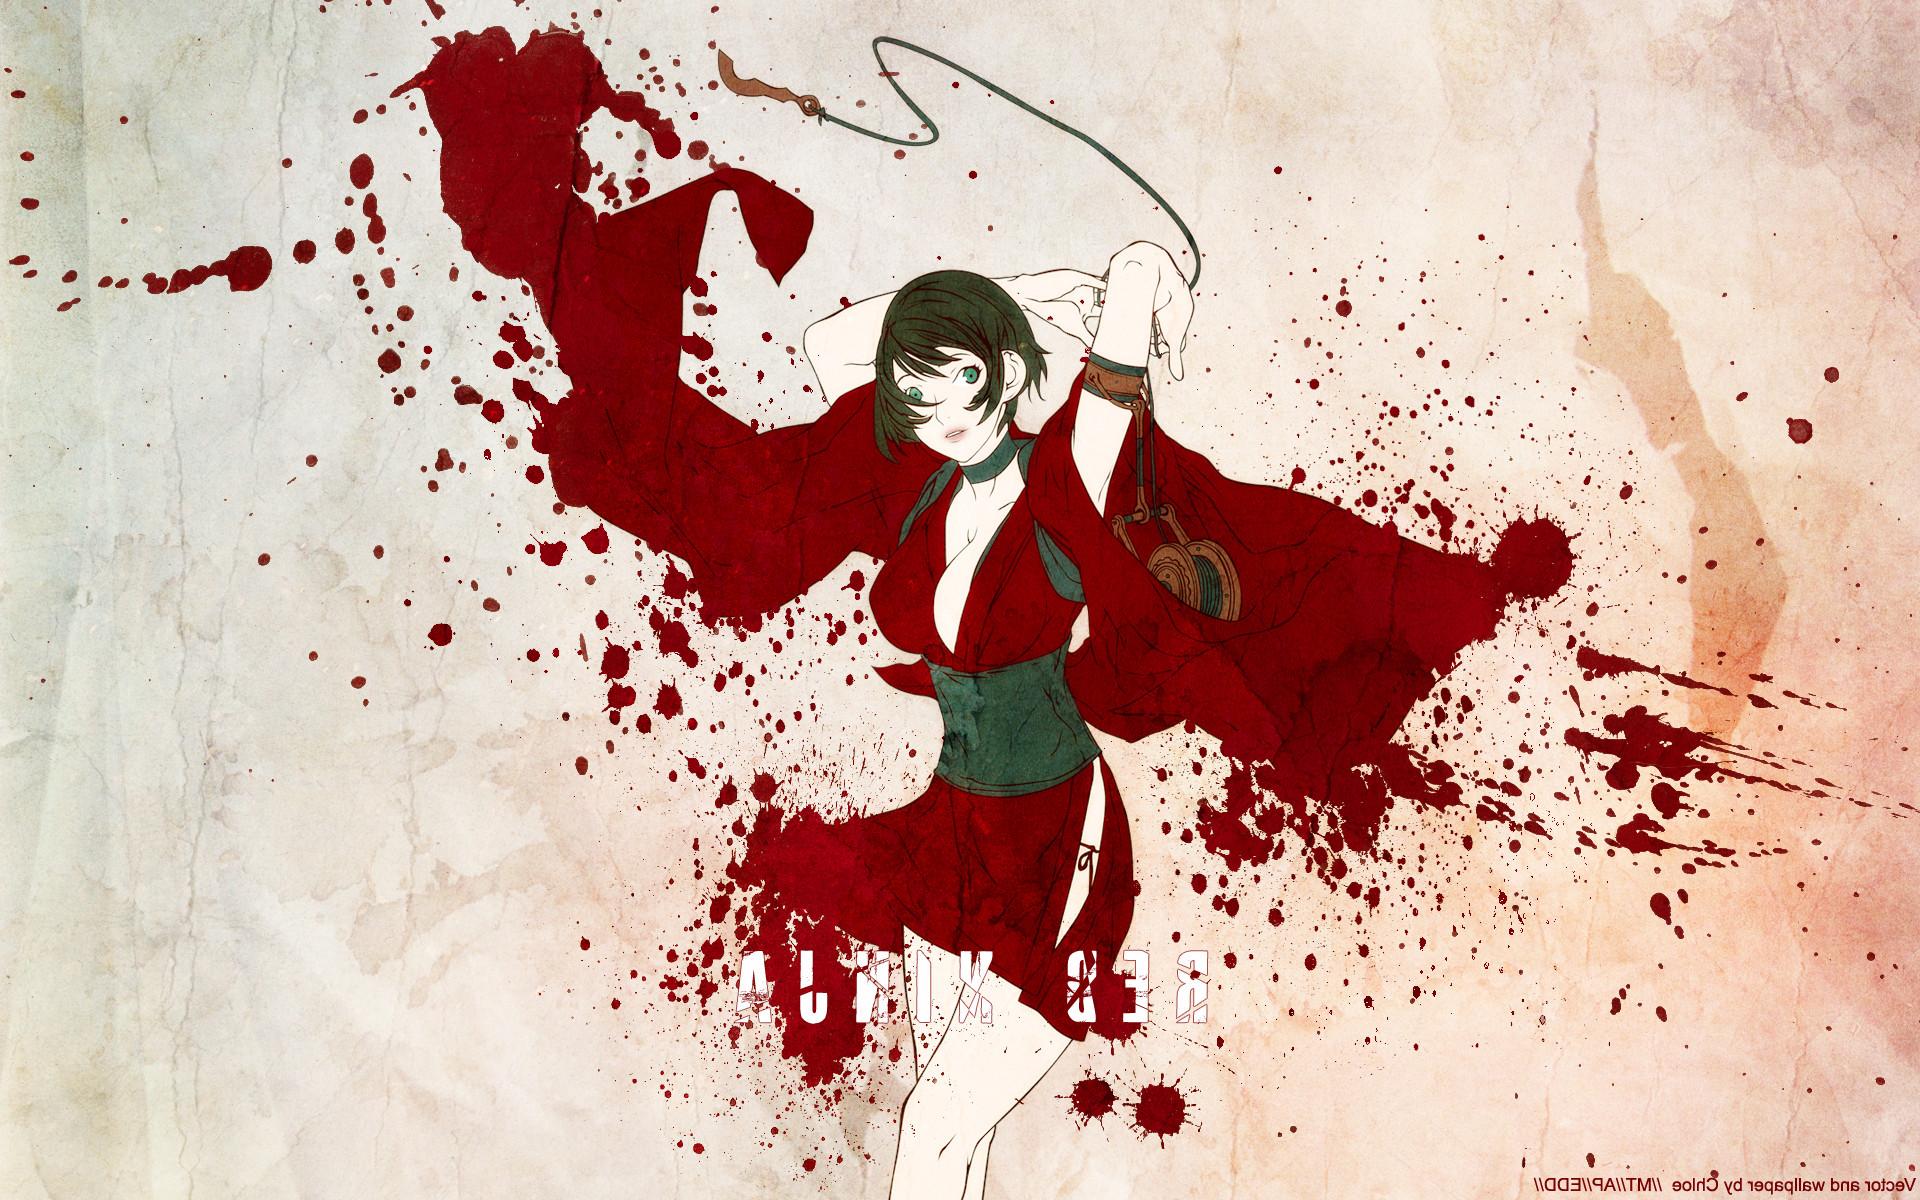 casting-asian-mask-wallpaper-evil-hentai